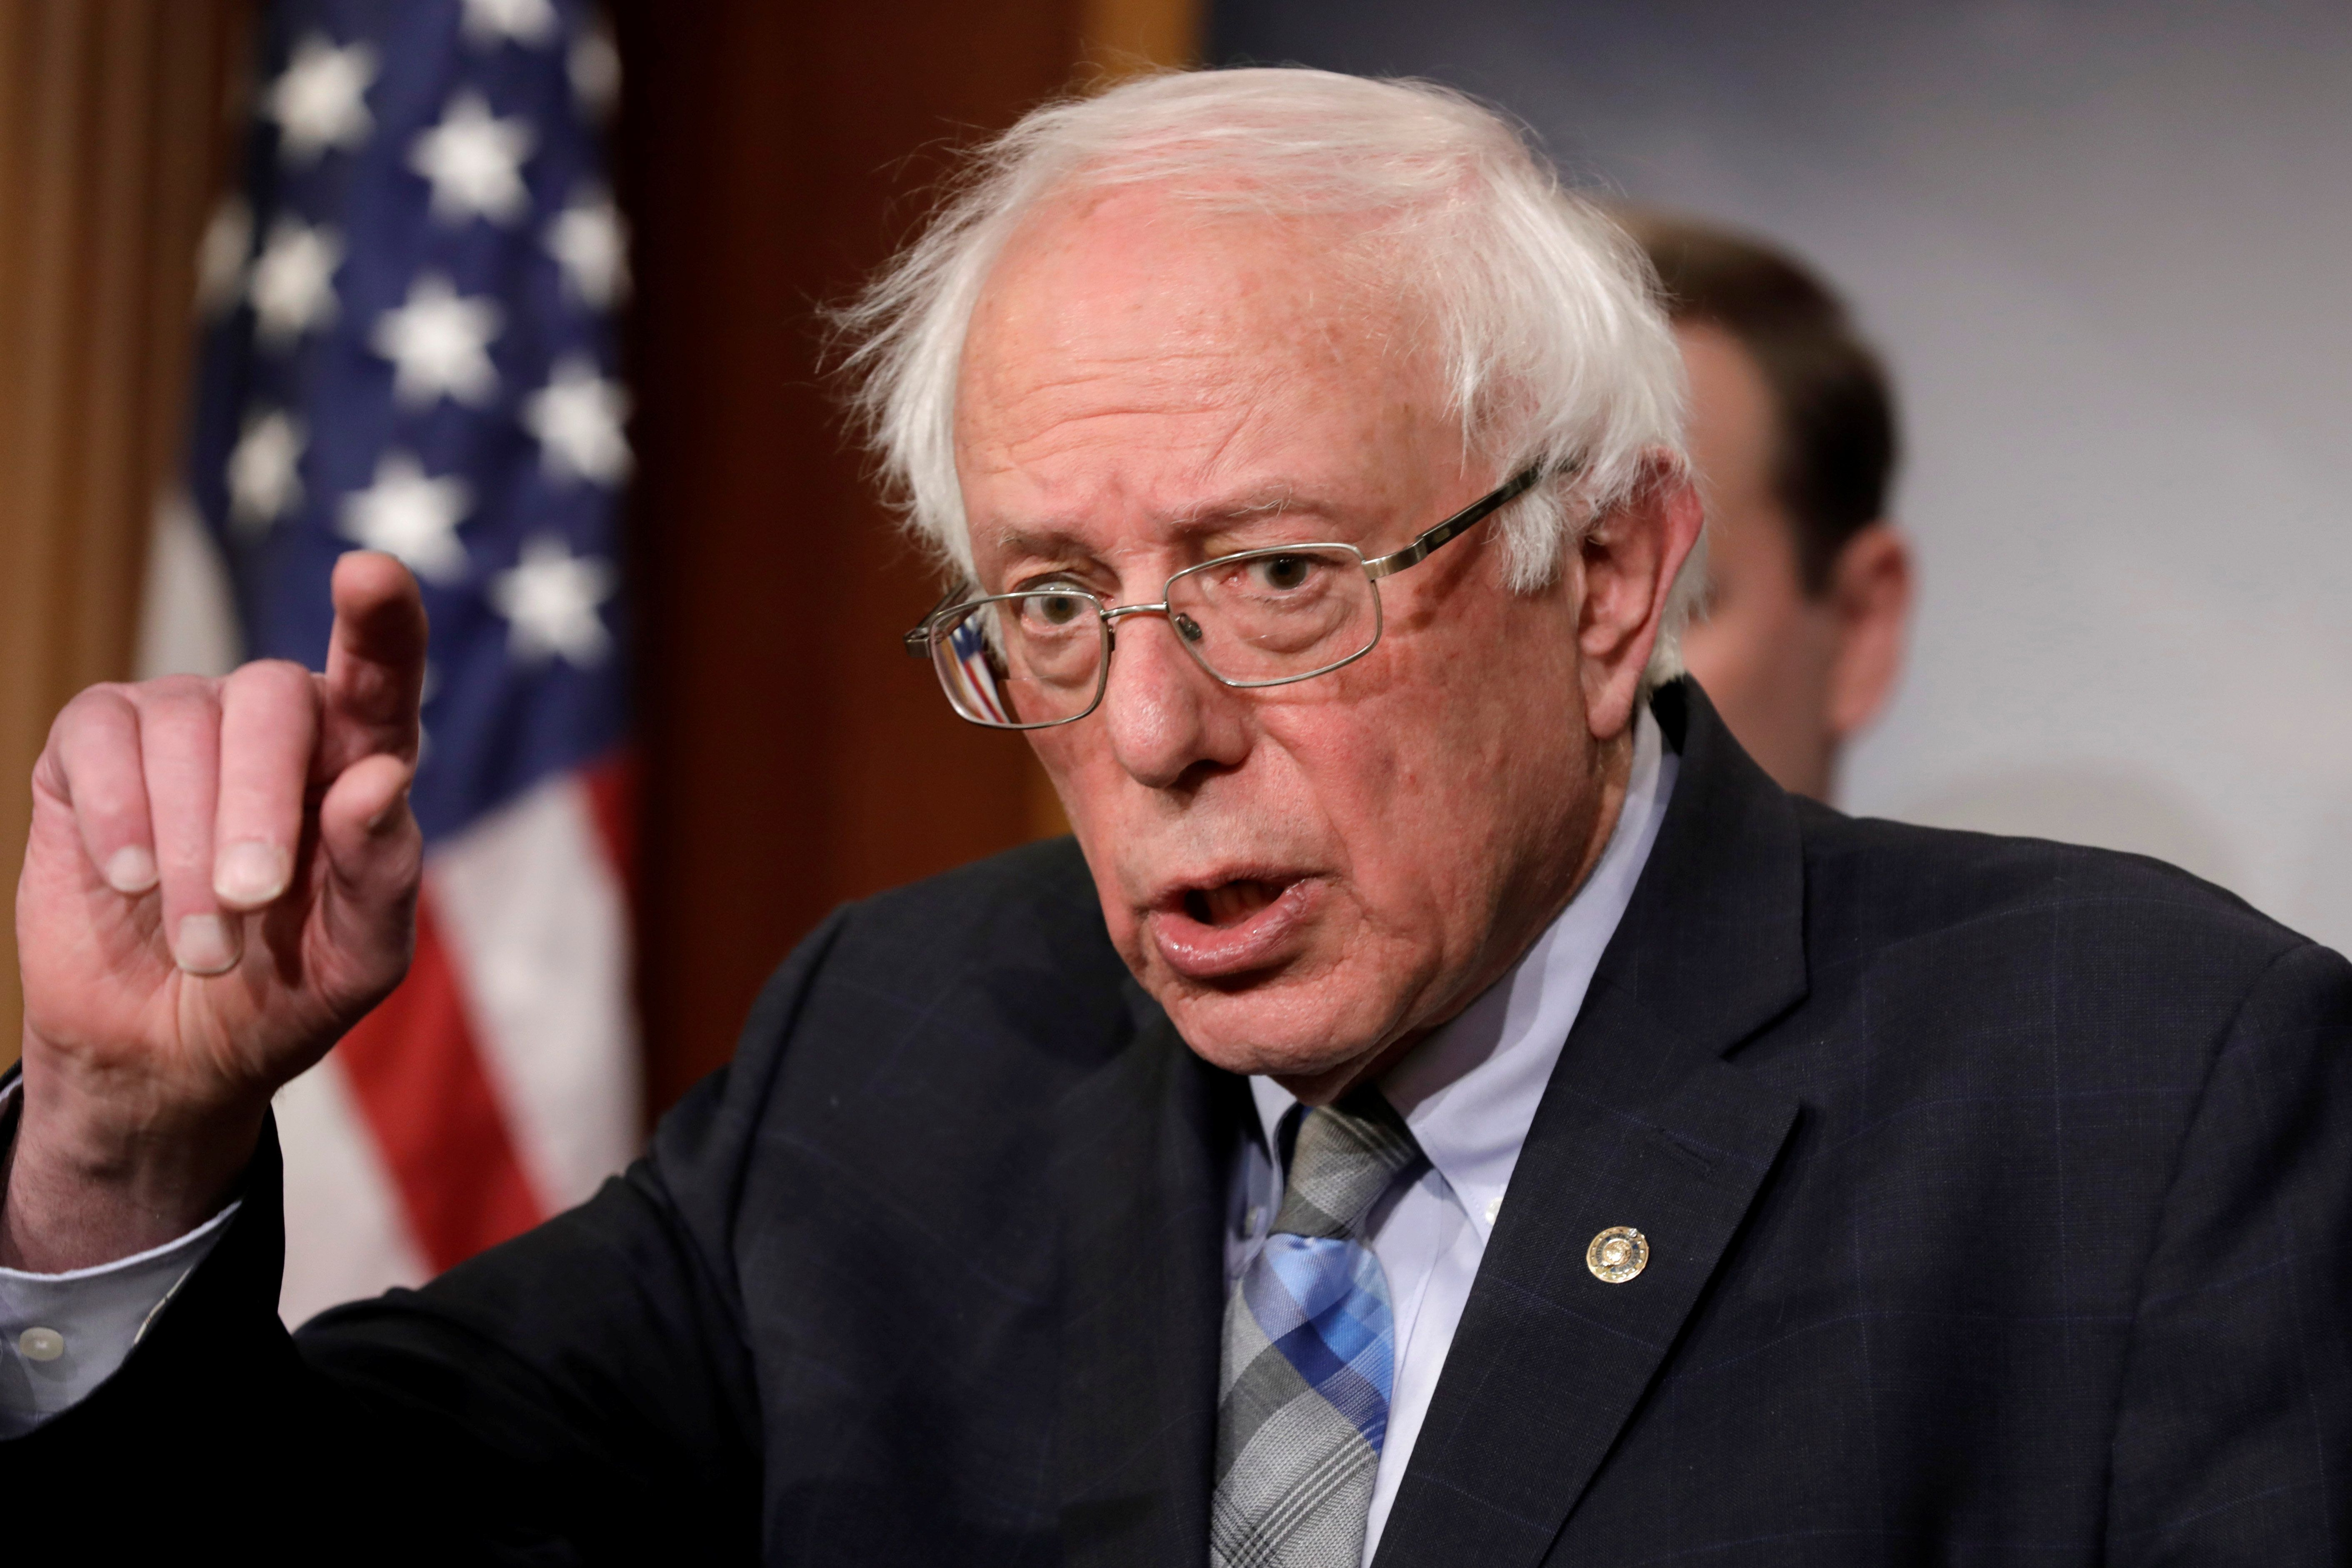 U.S. Senator Bernie Sanders speaks during a news conference on Yemen resolution on Capitol Hill in Washington, U.S., January 30, 2019. REUTERS/Yuri Gripas    .